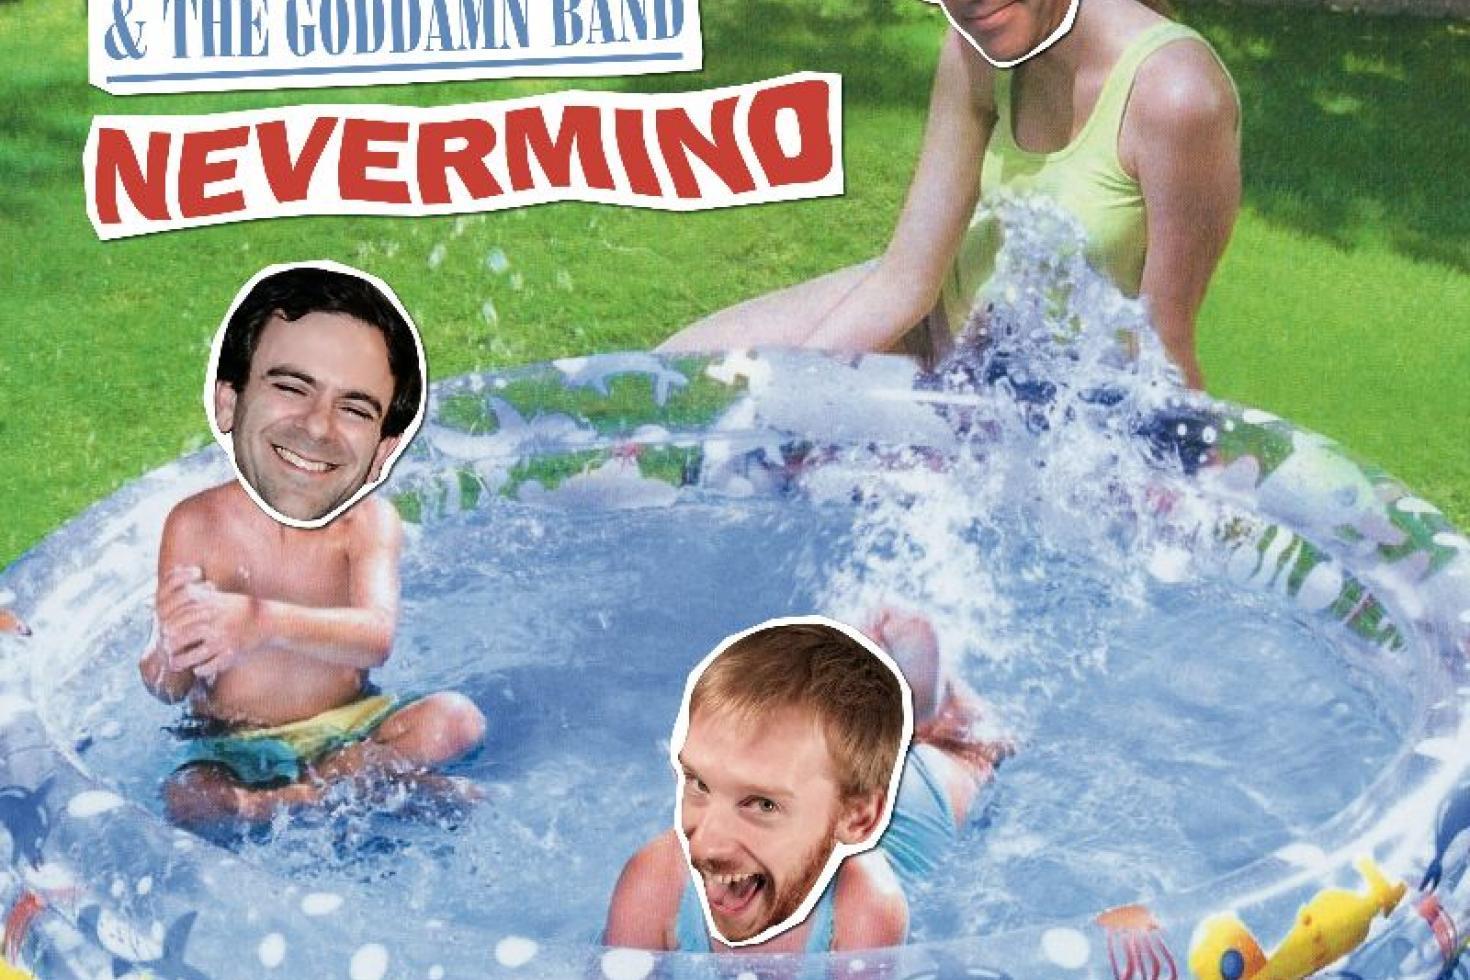 Kevin Devine announces full album cover of Nirvana's Nevermind